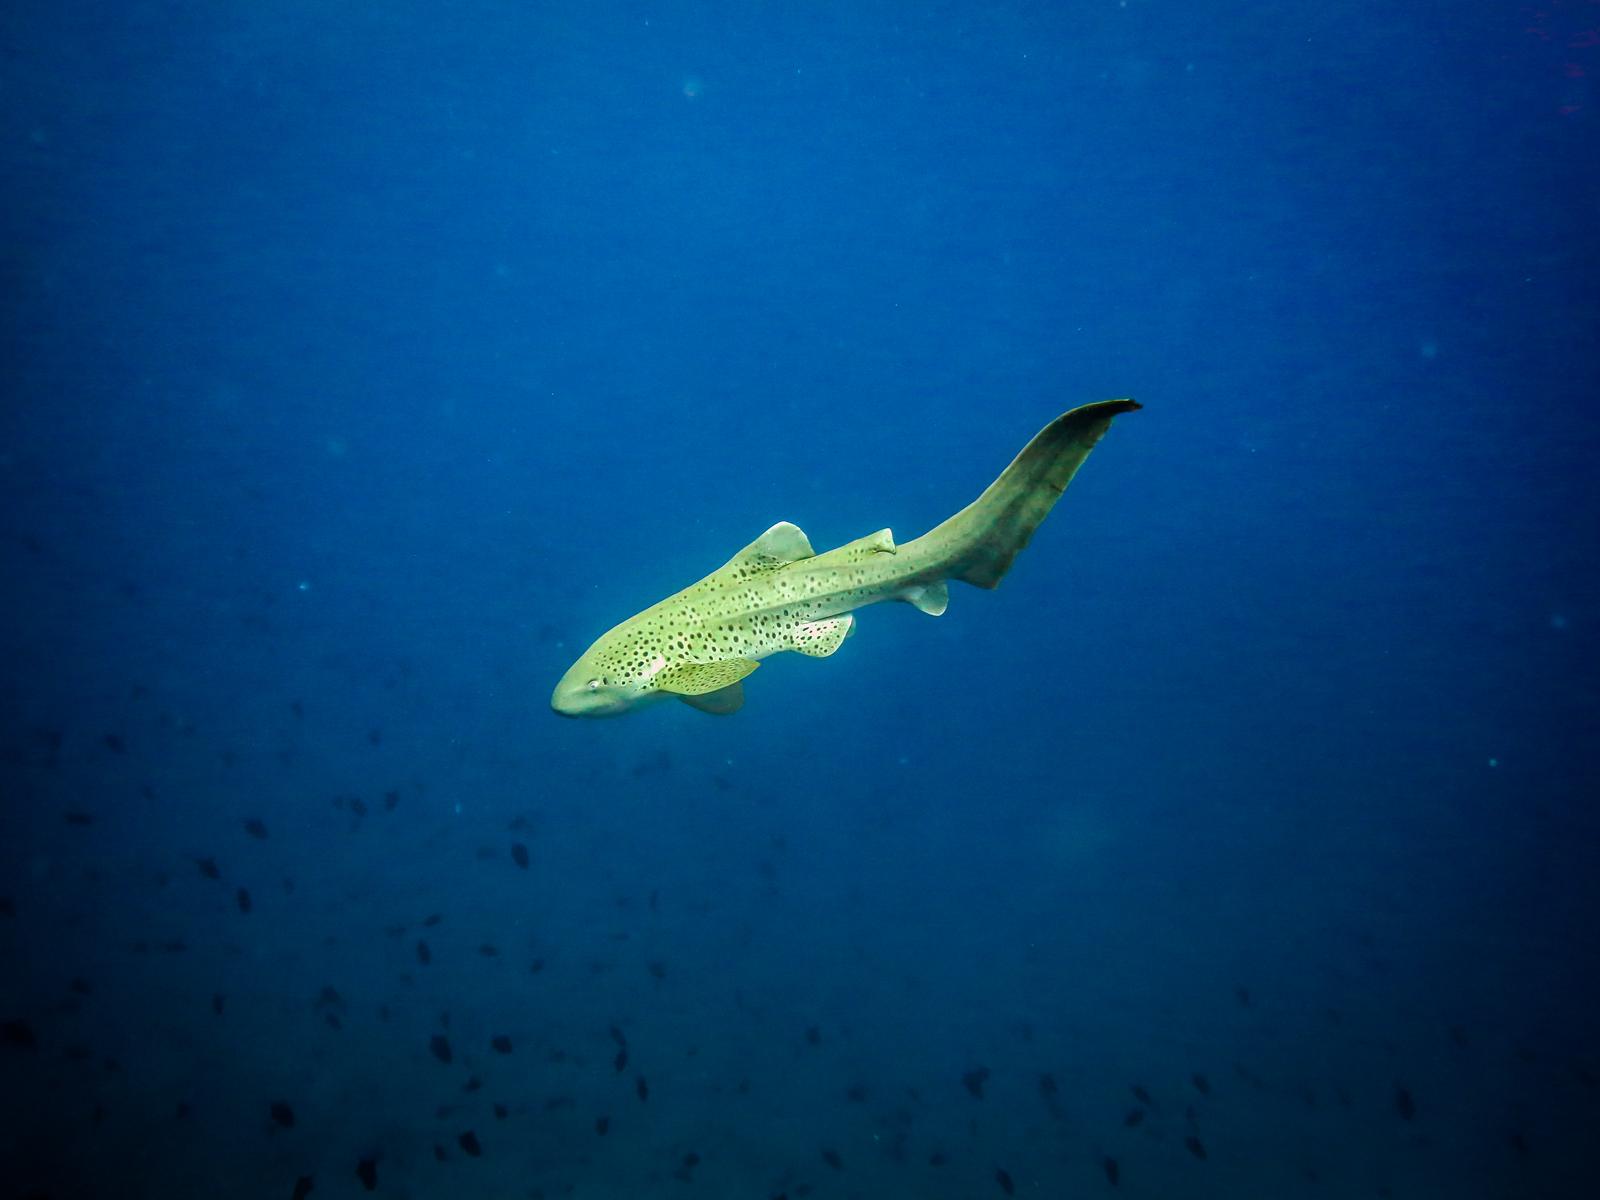 malediven 2014 (10 of 14)